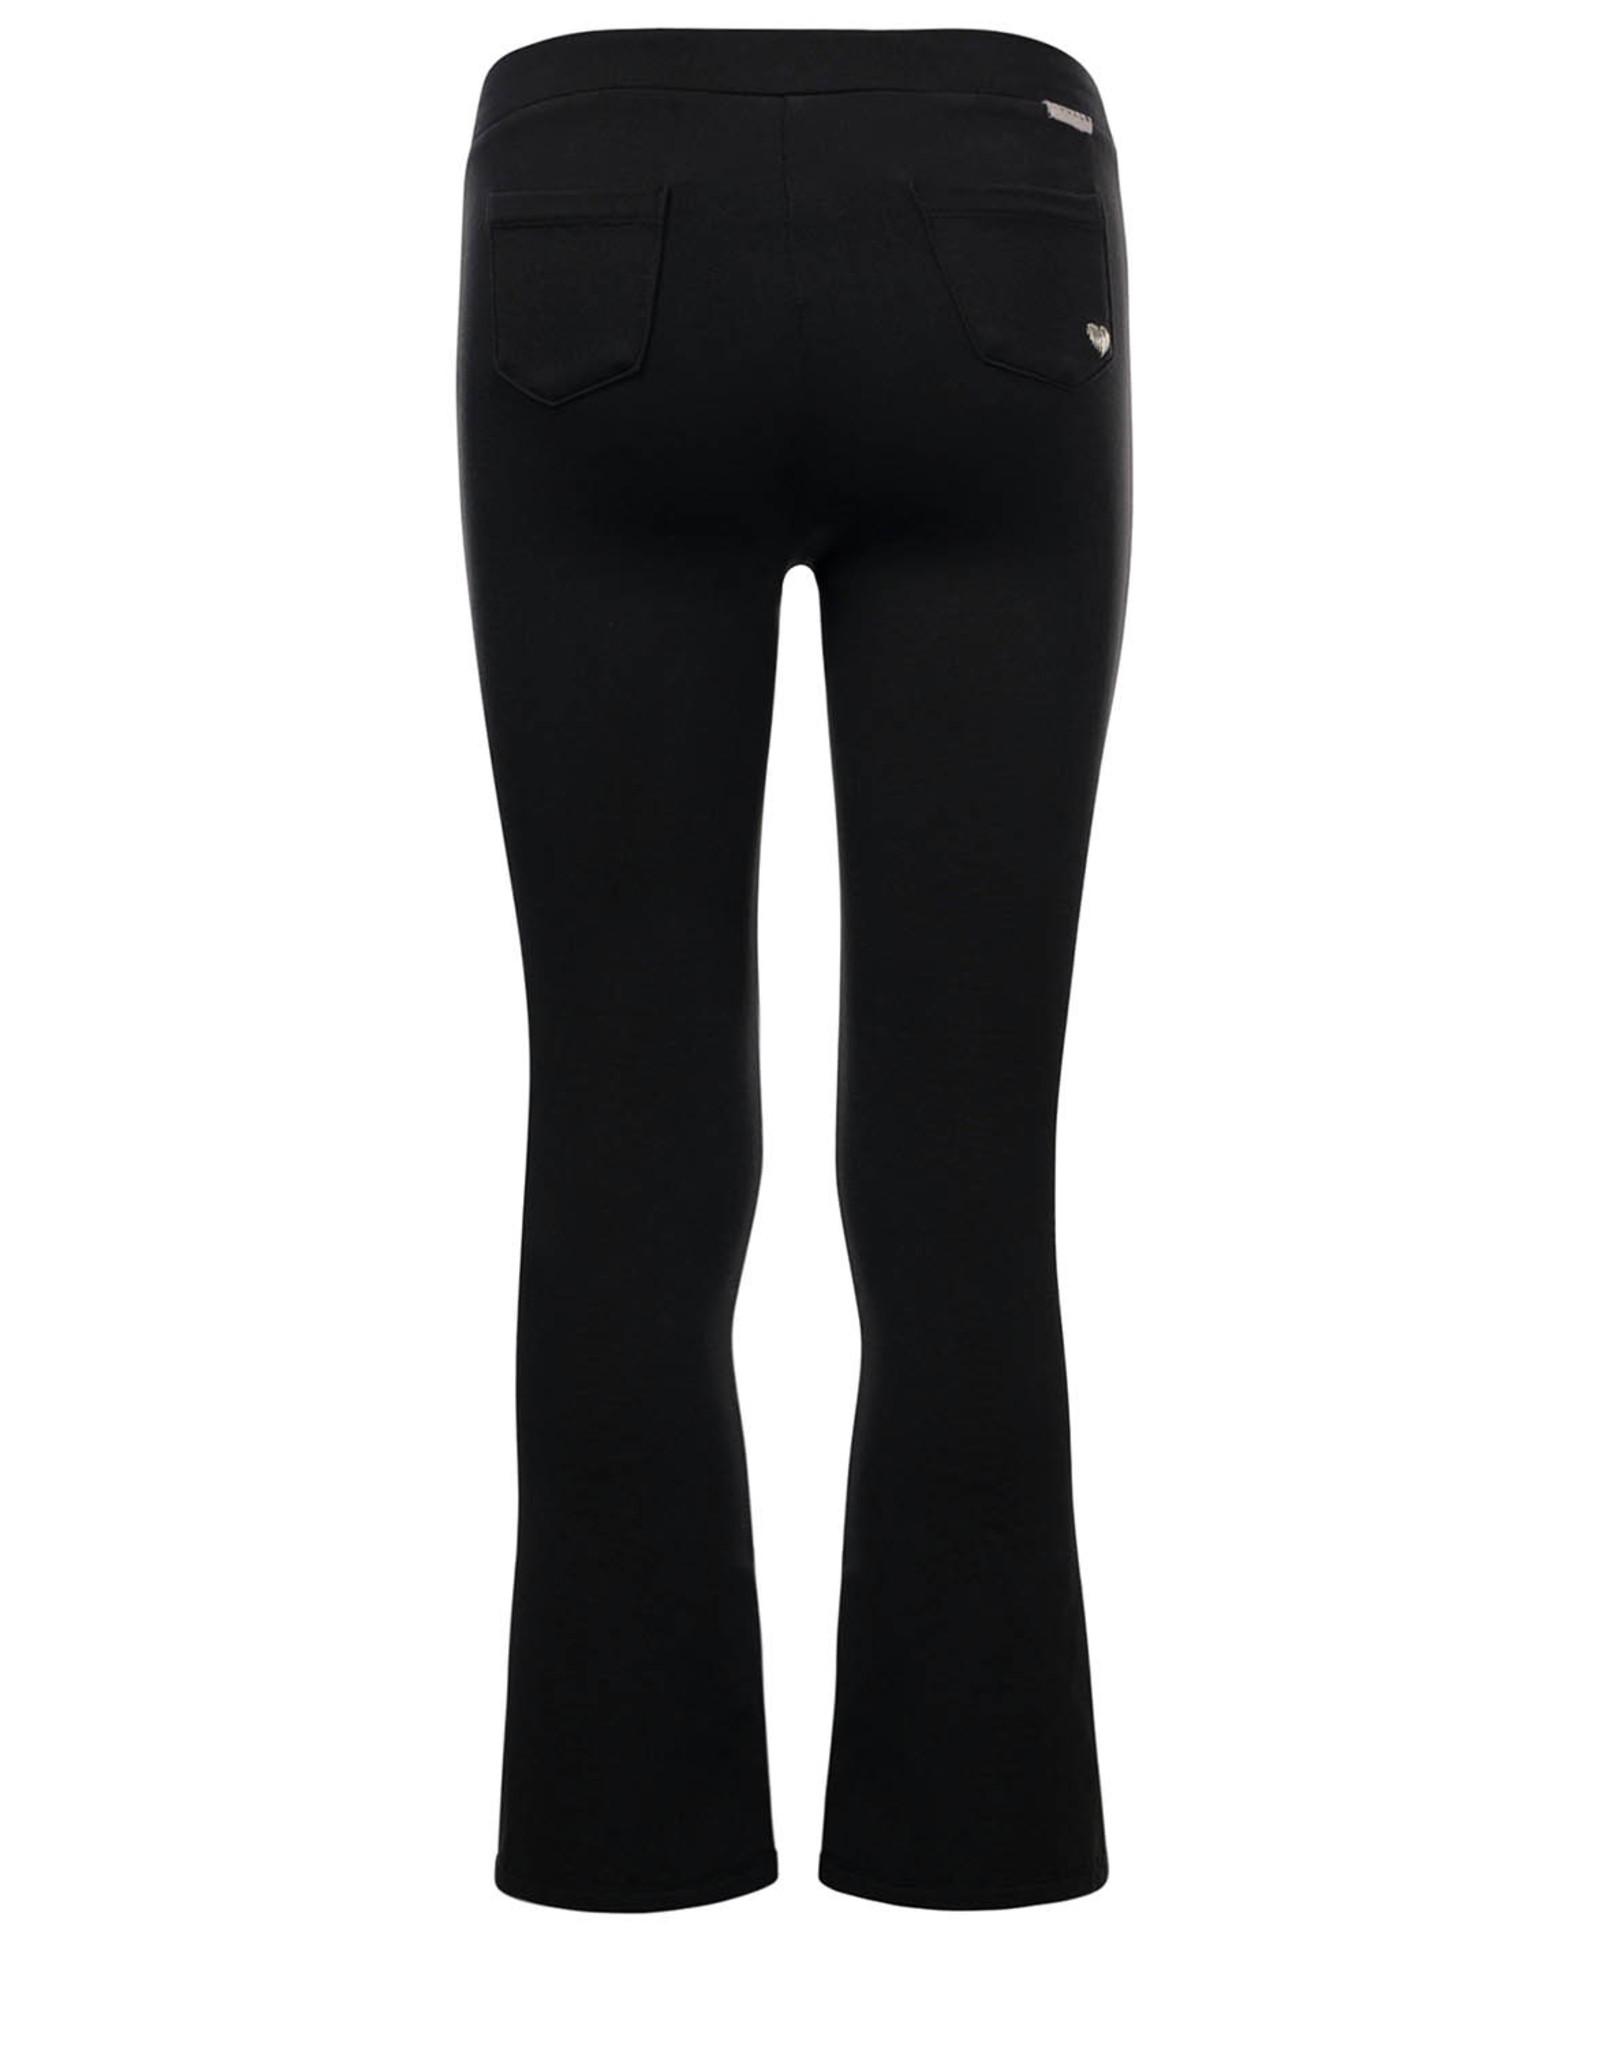 LOOXS Little Little sweat flair pants,  black